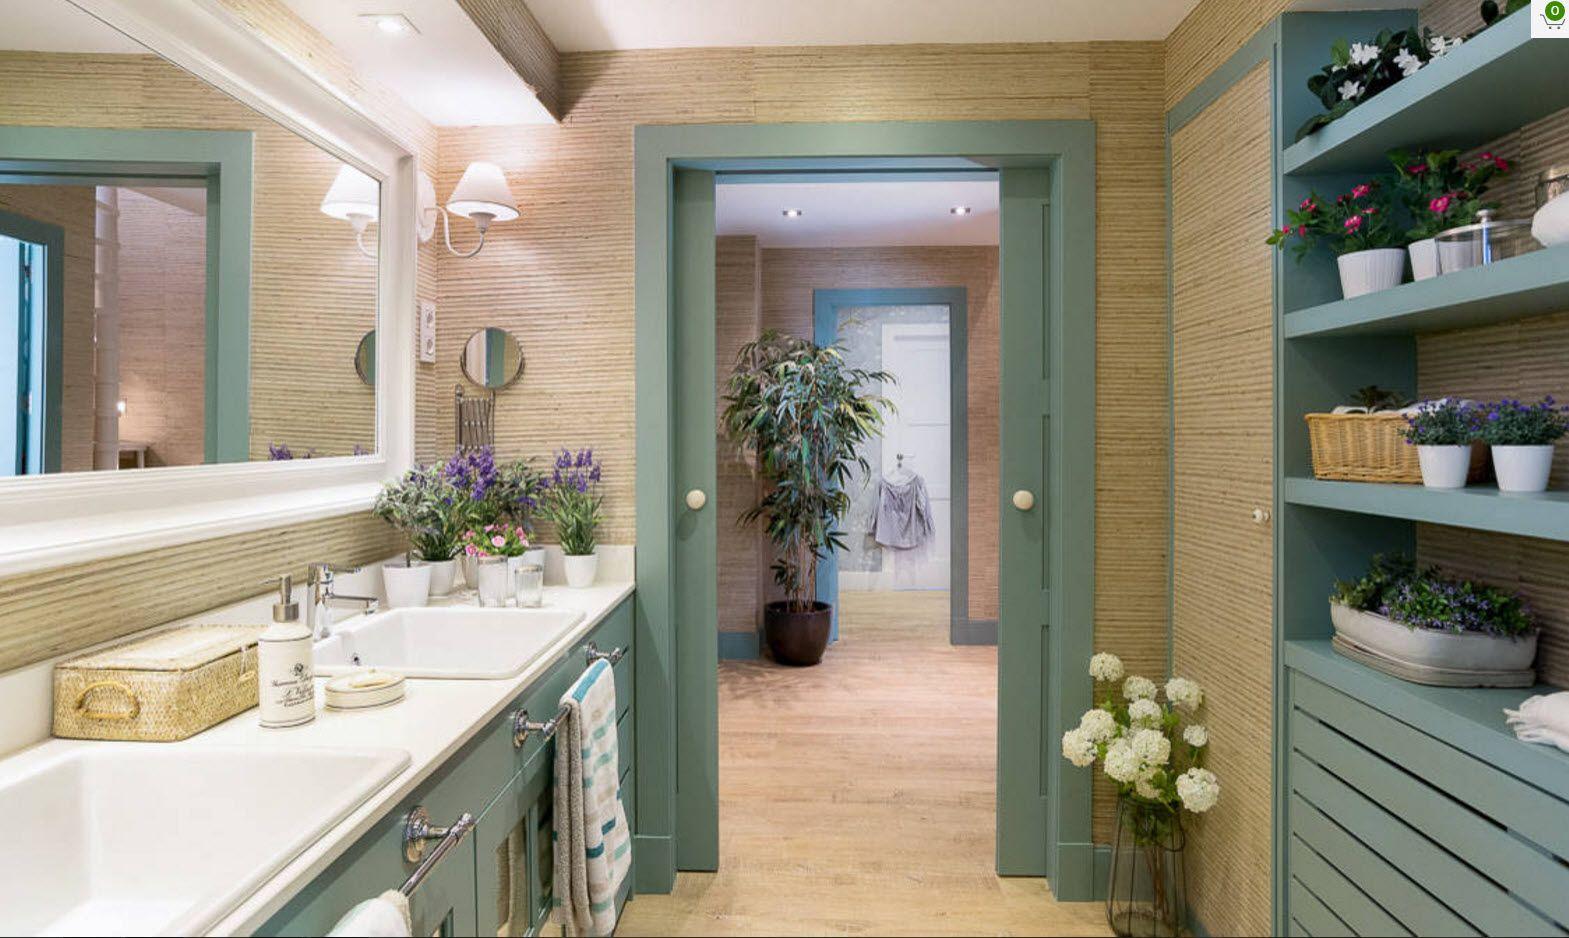 Pastel olive green door frame and bathroom vanity set